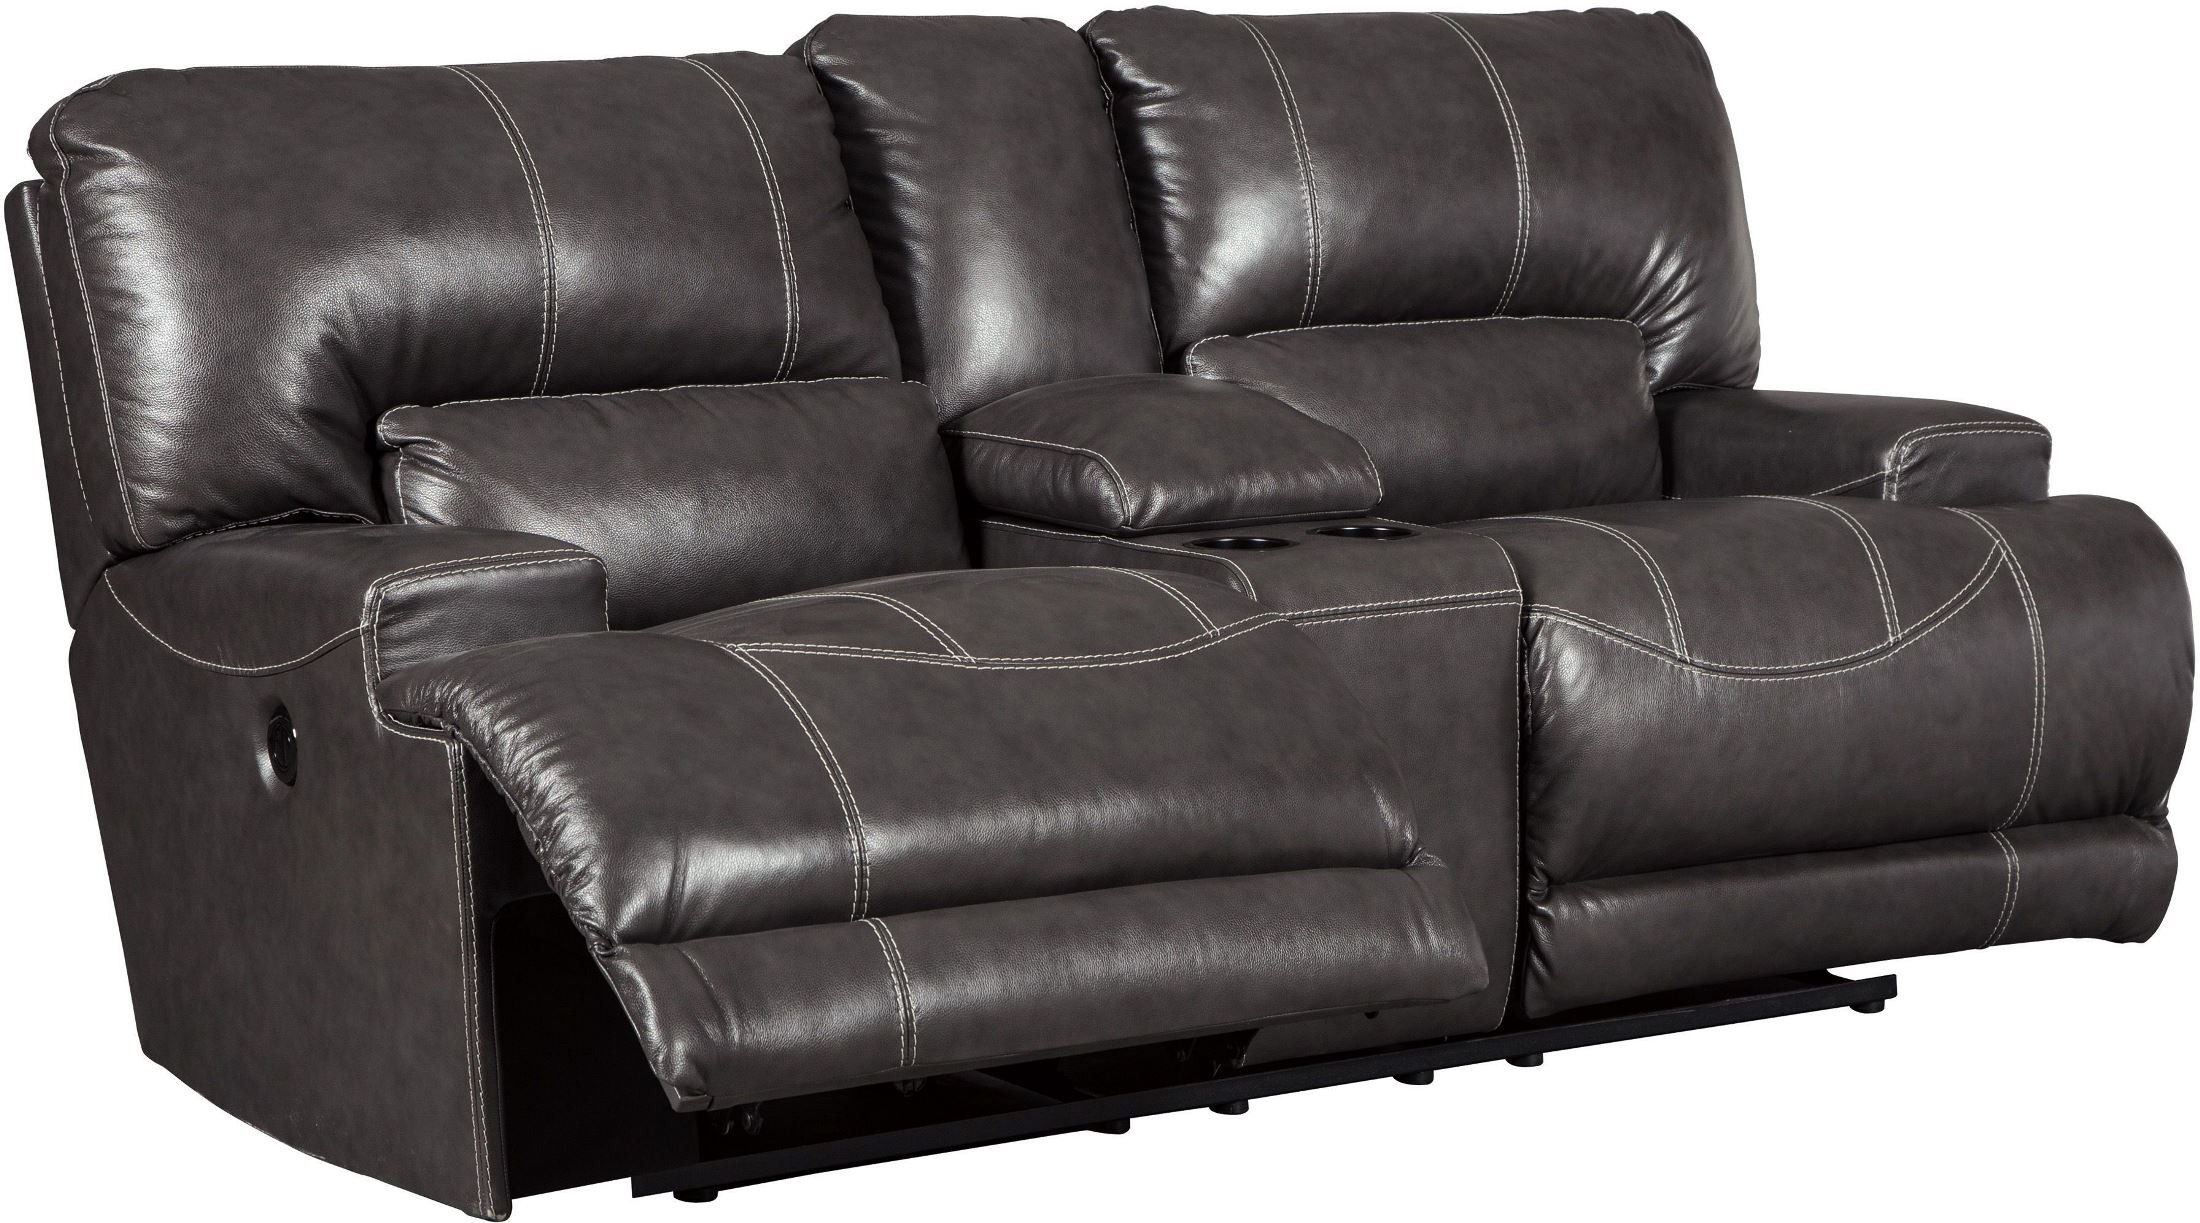 grey power reclining sofa divani online company mccaskill gray double console loveseat